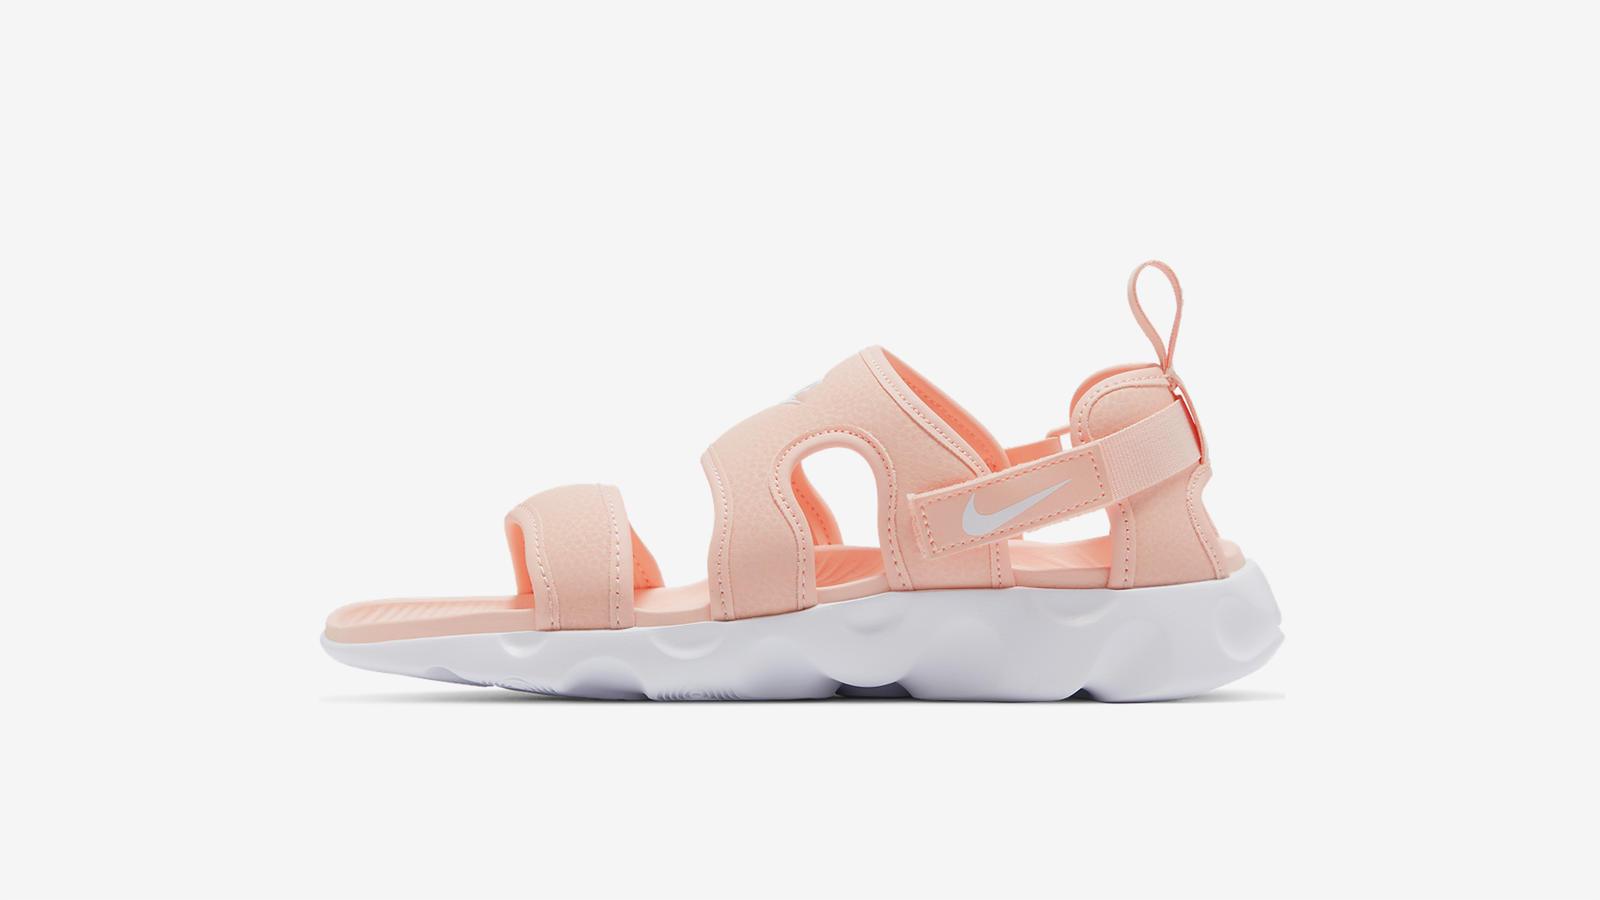 nike-sportswear-summer-2020-sandals-nike-canyon-nike-asuna-nike-owaysis